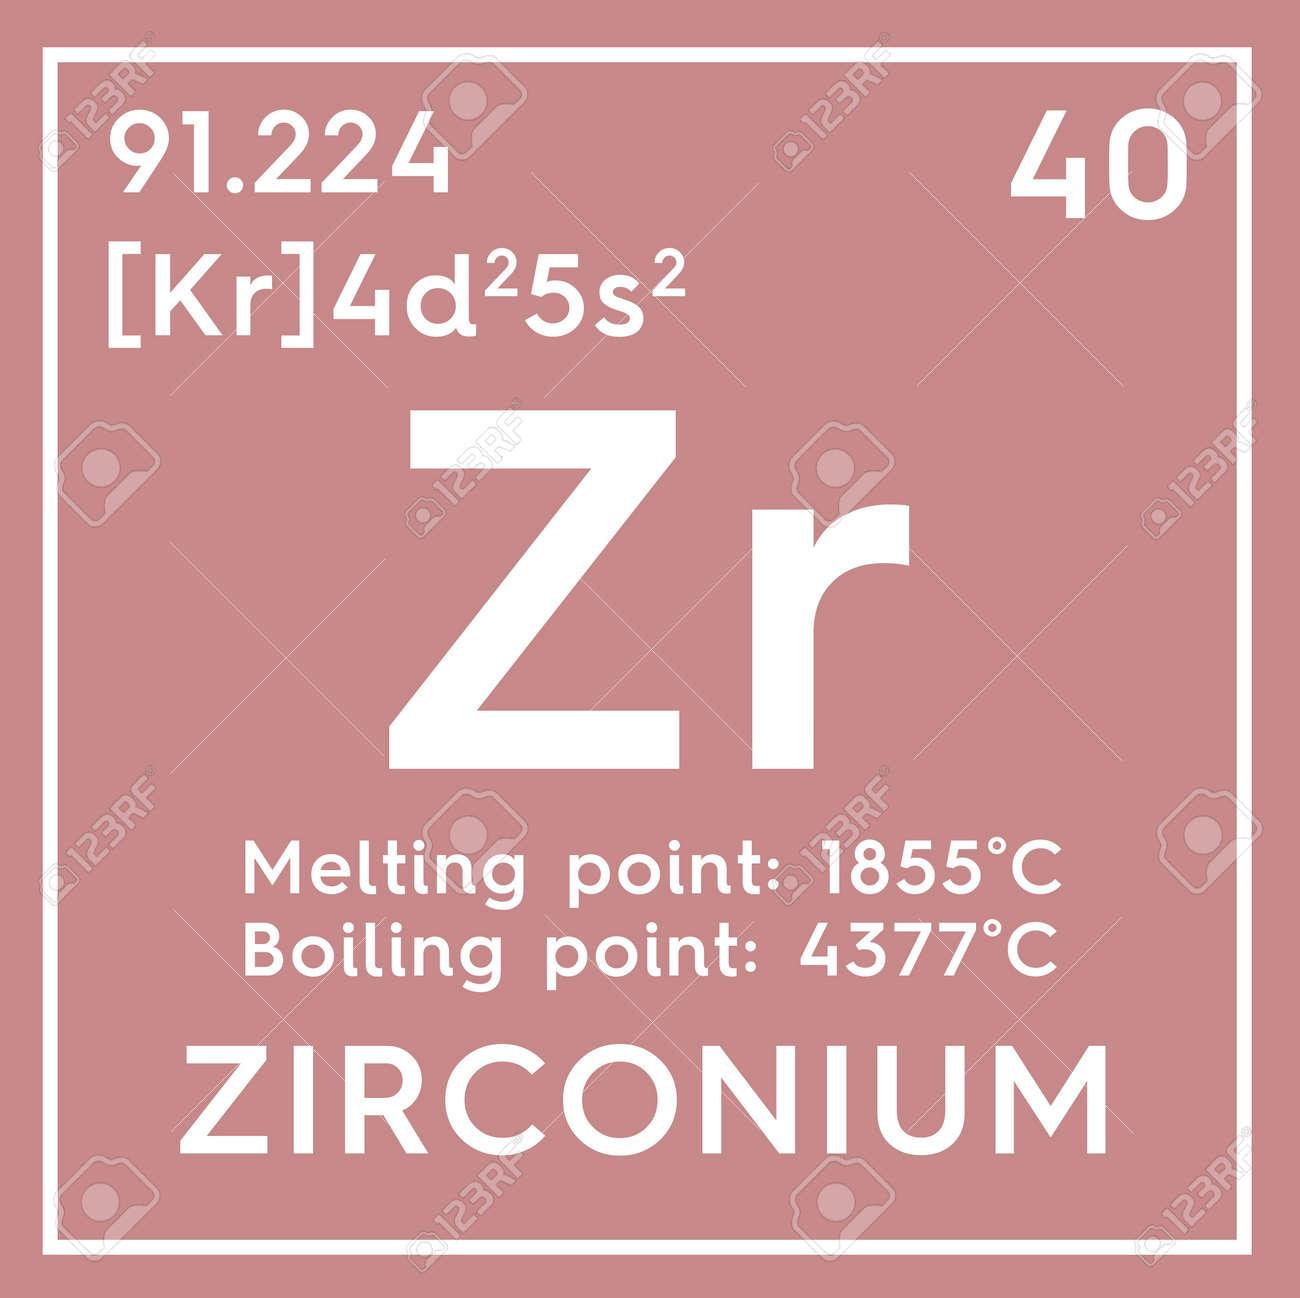 Circonio metales de transicin elemento qumico de la tabla circonio metales de transicin elemento qumico de la tabla peridica de mendeleev zirconio urtaz Choice Image